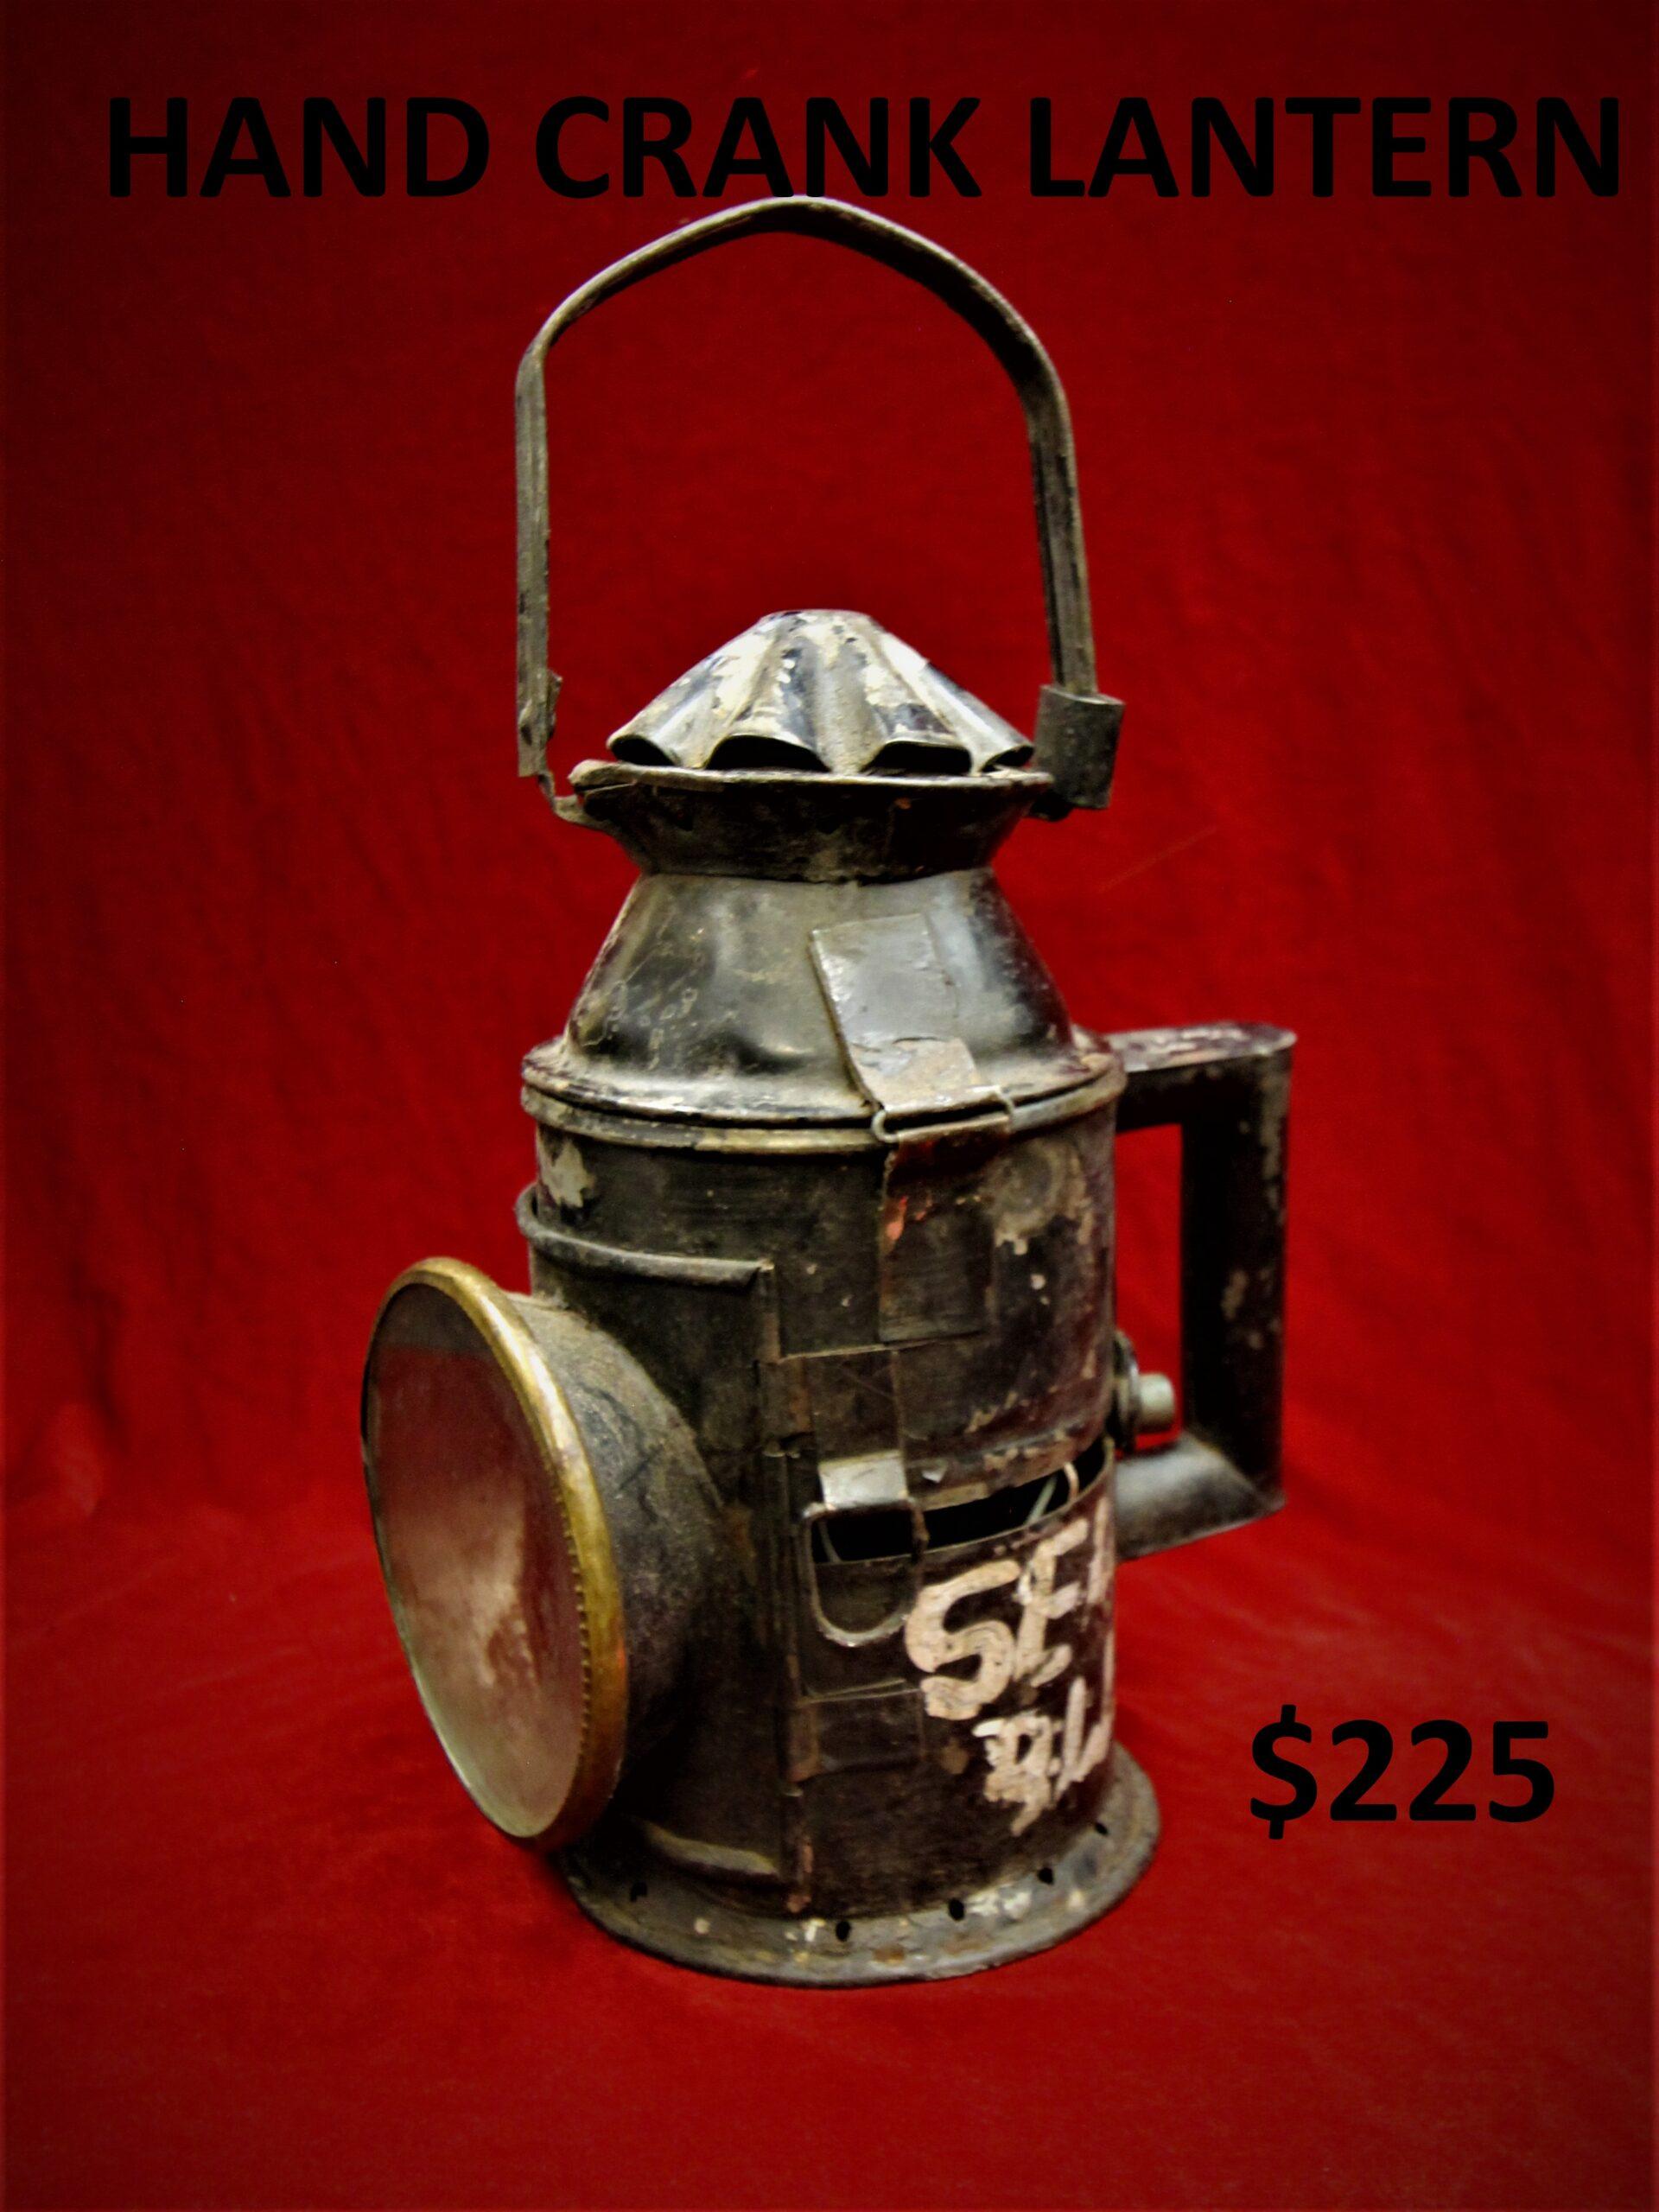 Hand Crank Lantern Image